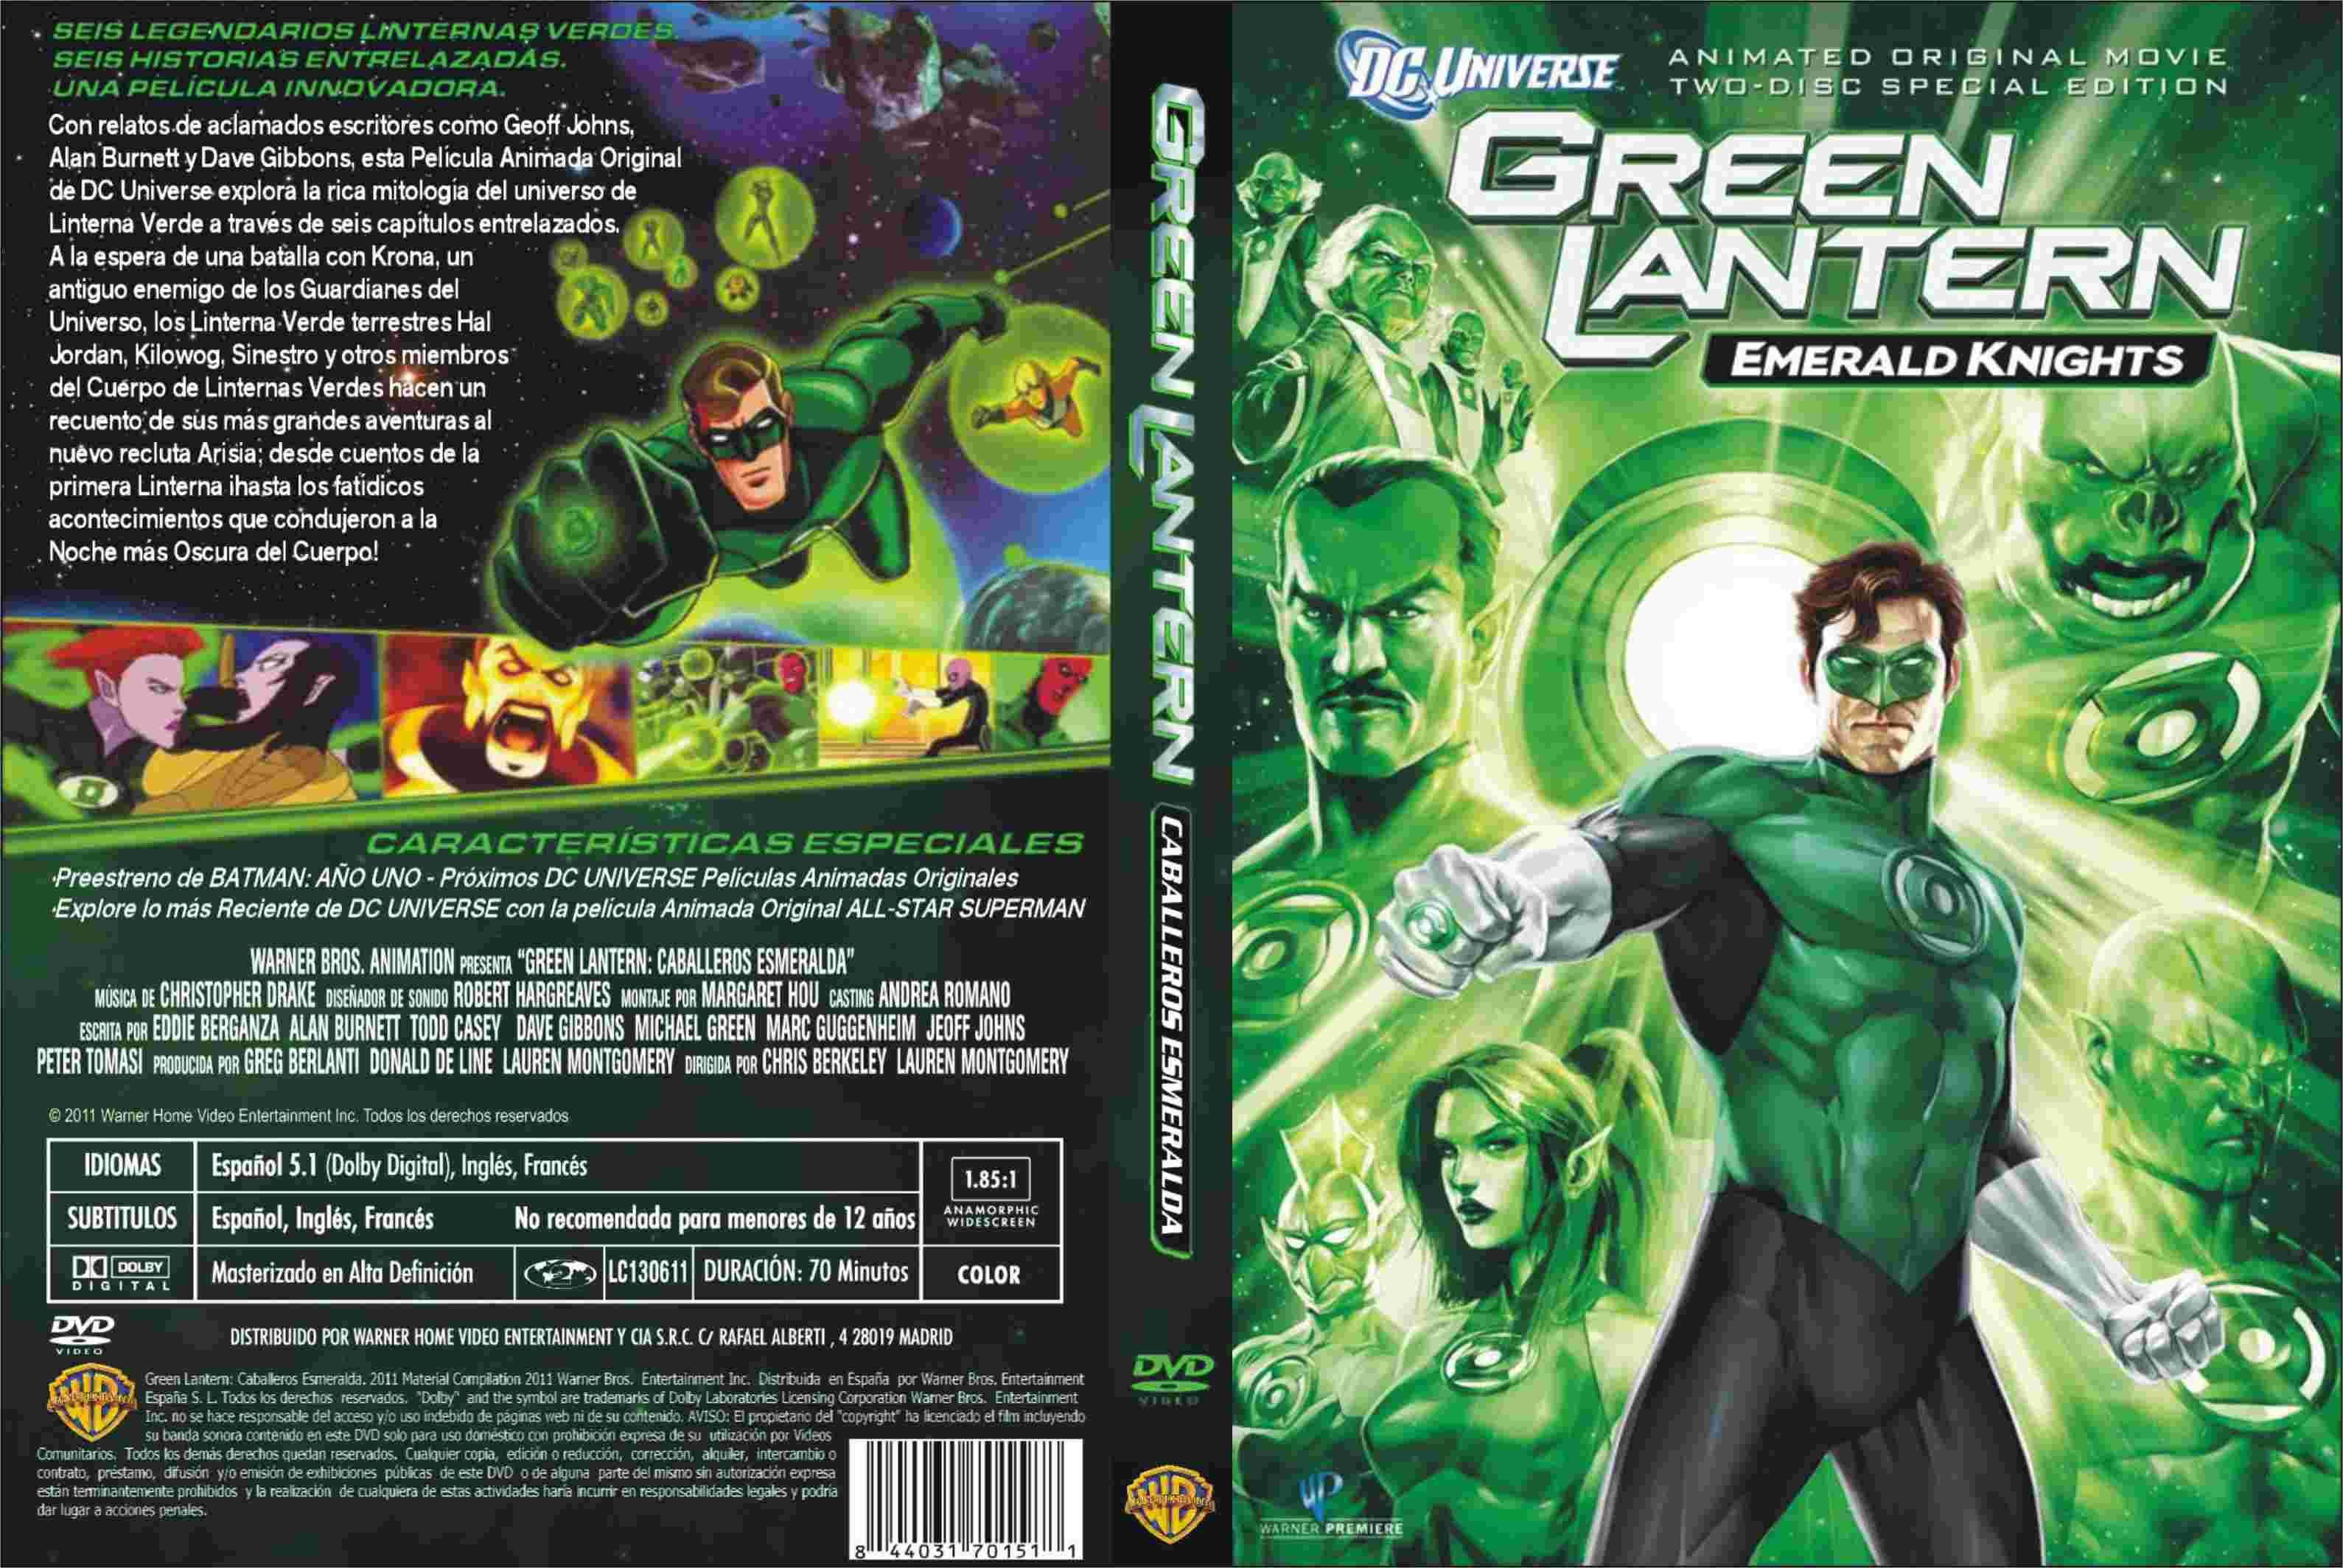 Green Lanter Emerald Knight Formato Dvd Comics Dc Comics Portadas